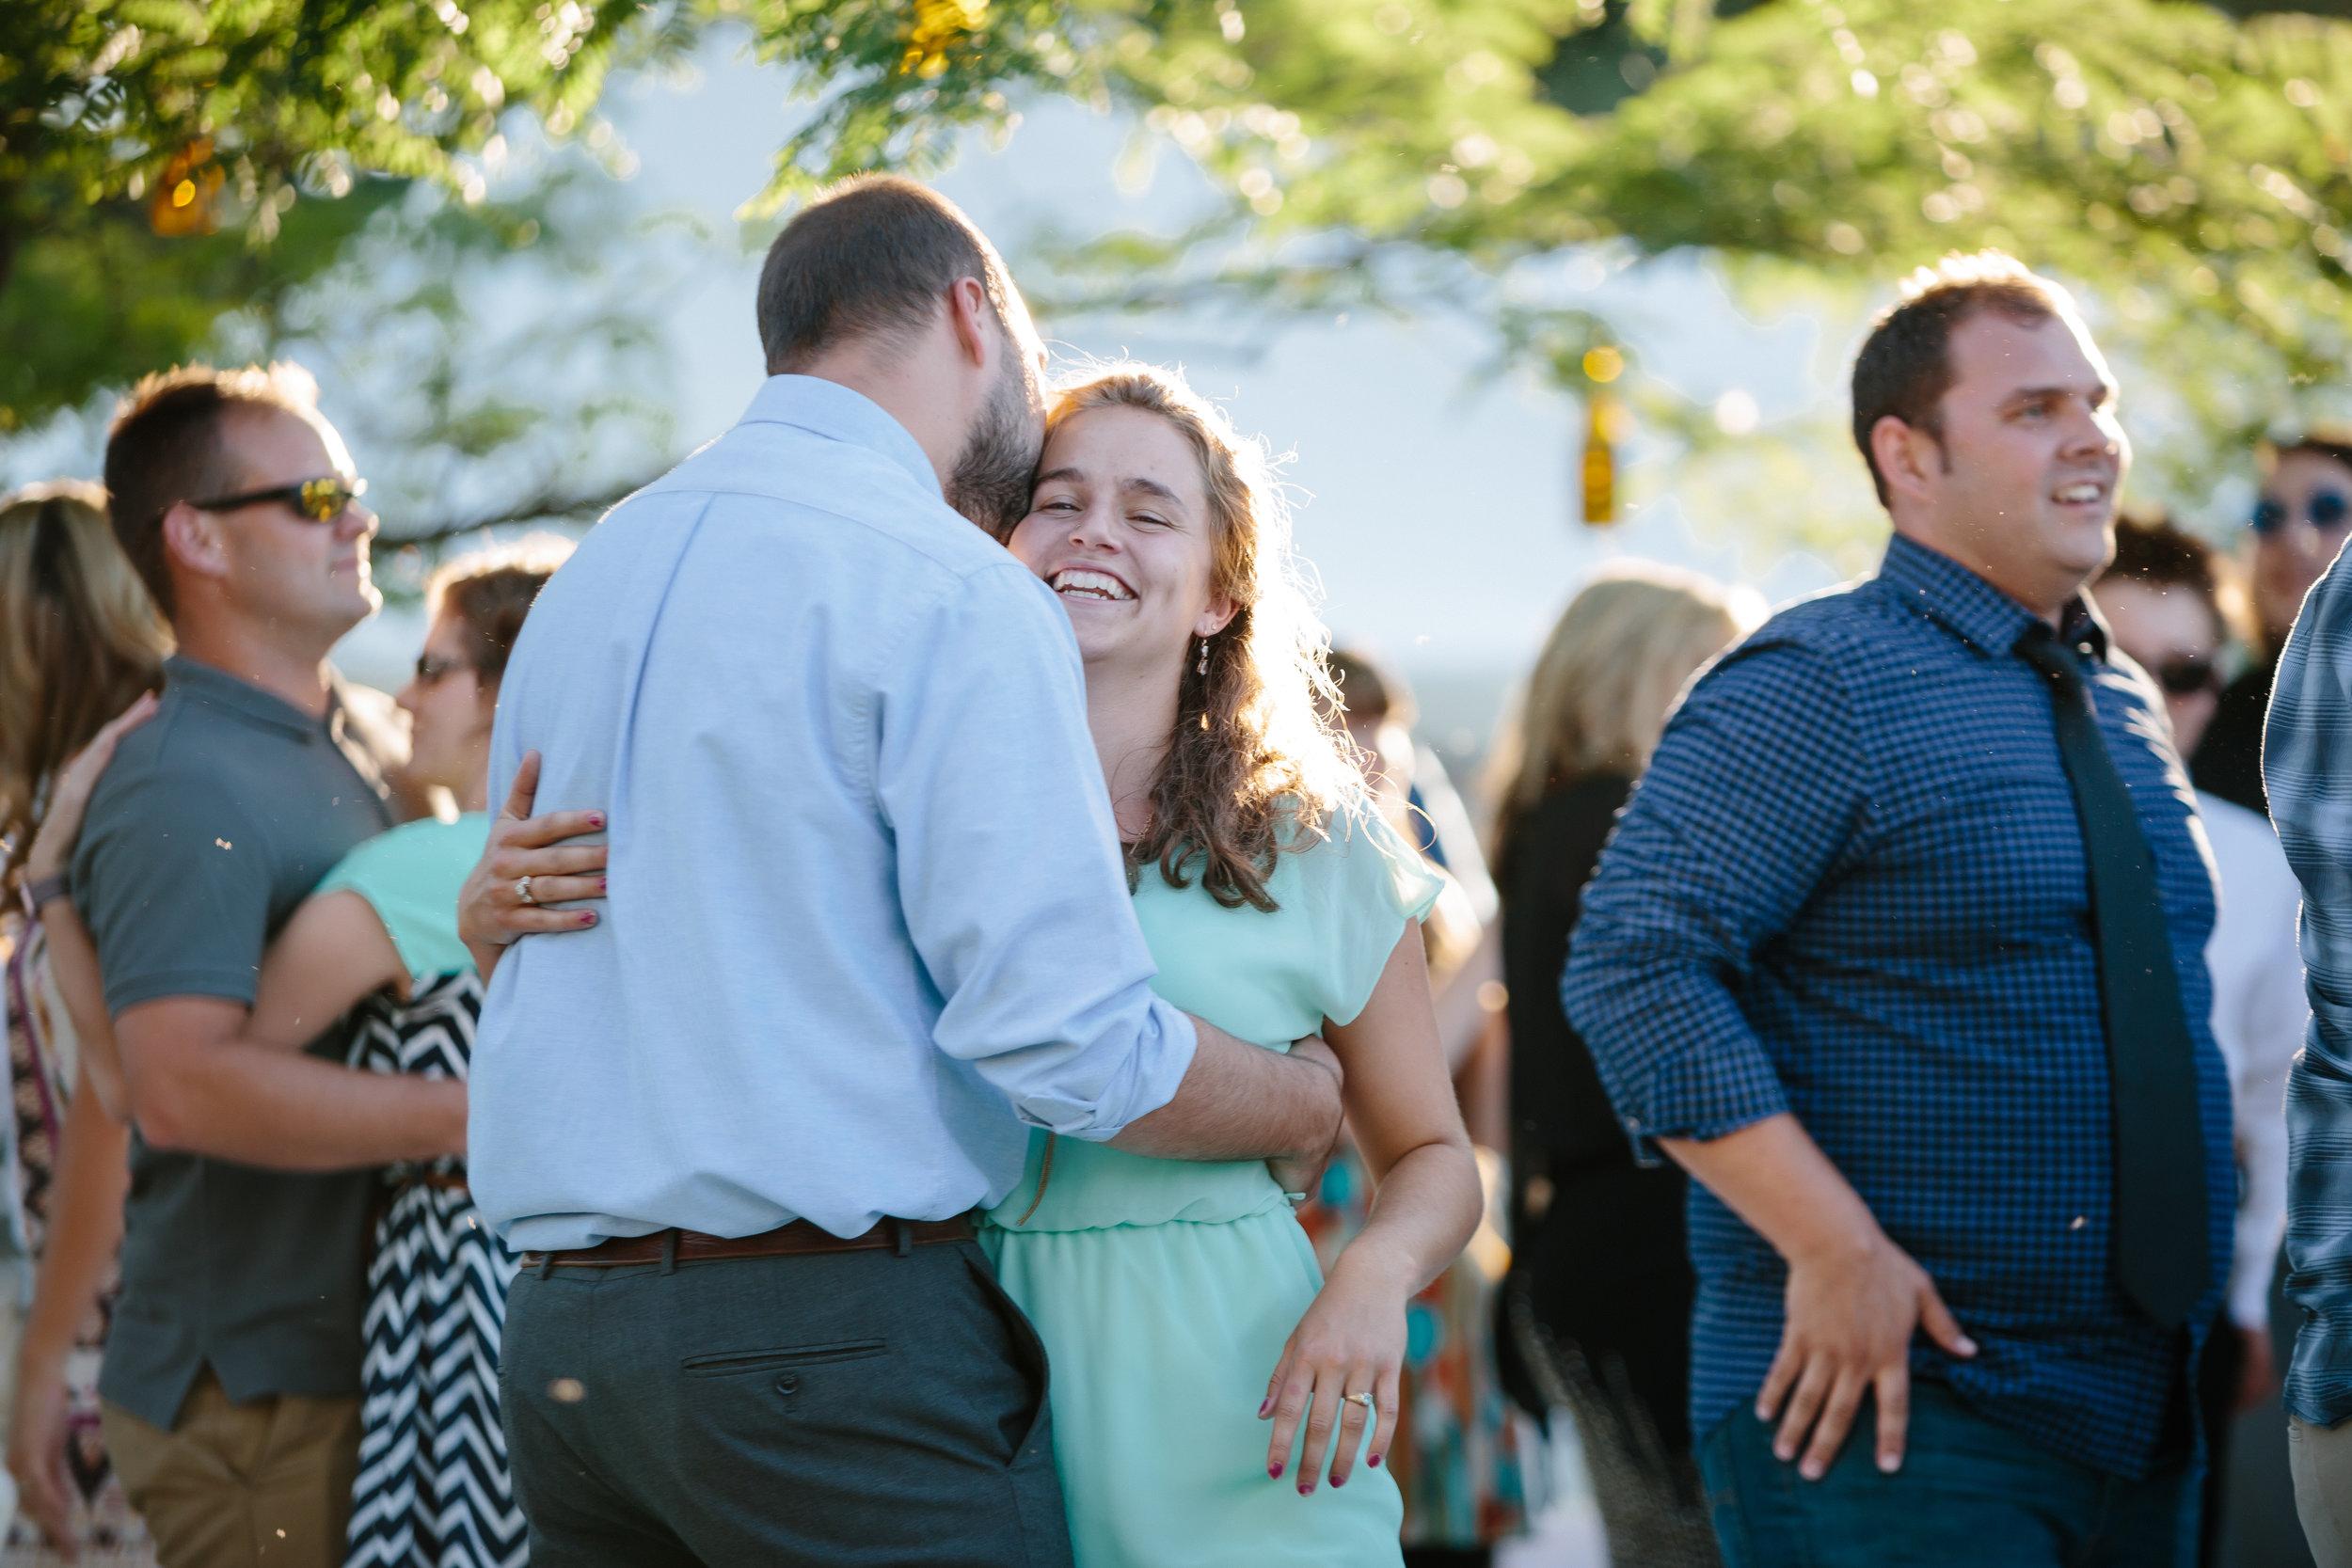 Jordan & Shantel Married - Idaho - Corrie Mick Photography-324.jpg